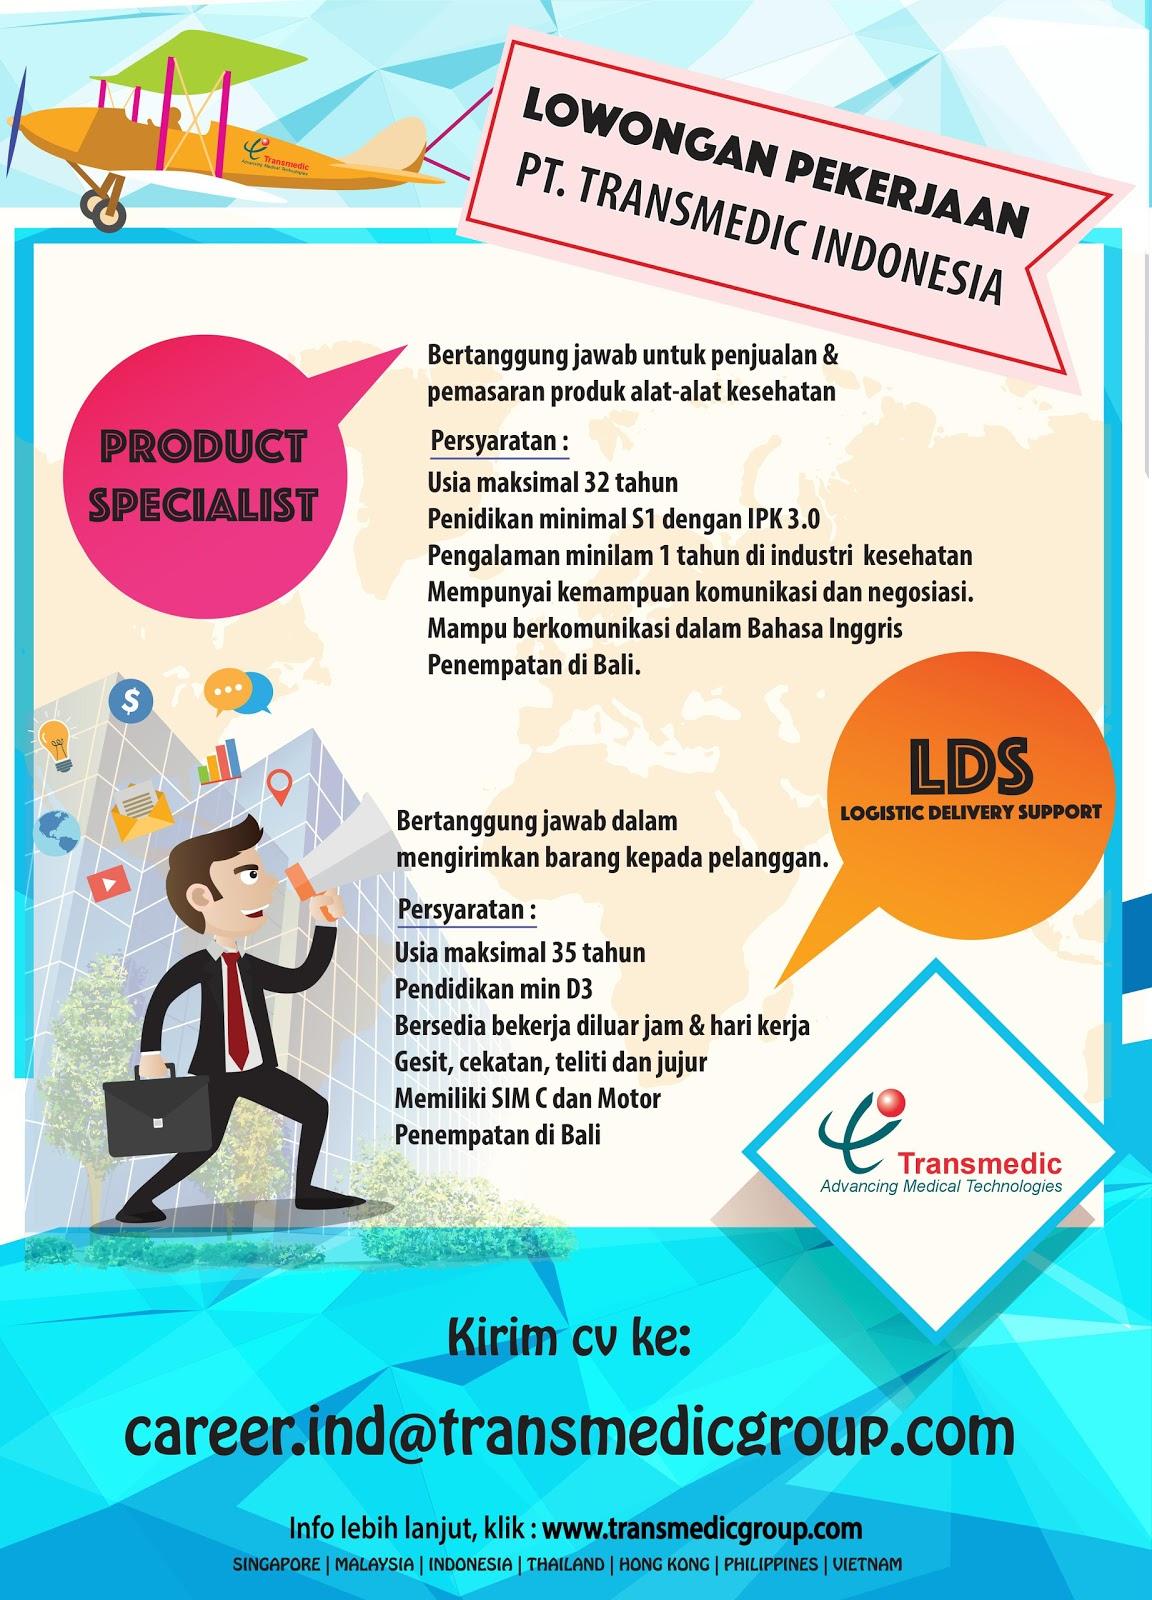 Lowongan Kerja Product Specialist Transmedic Indonesia